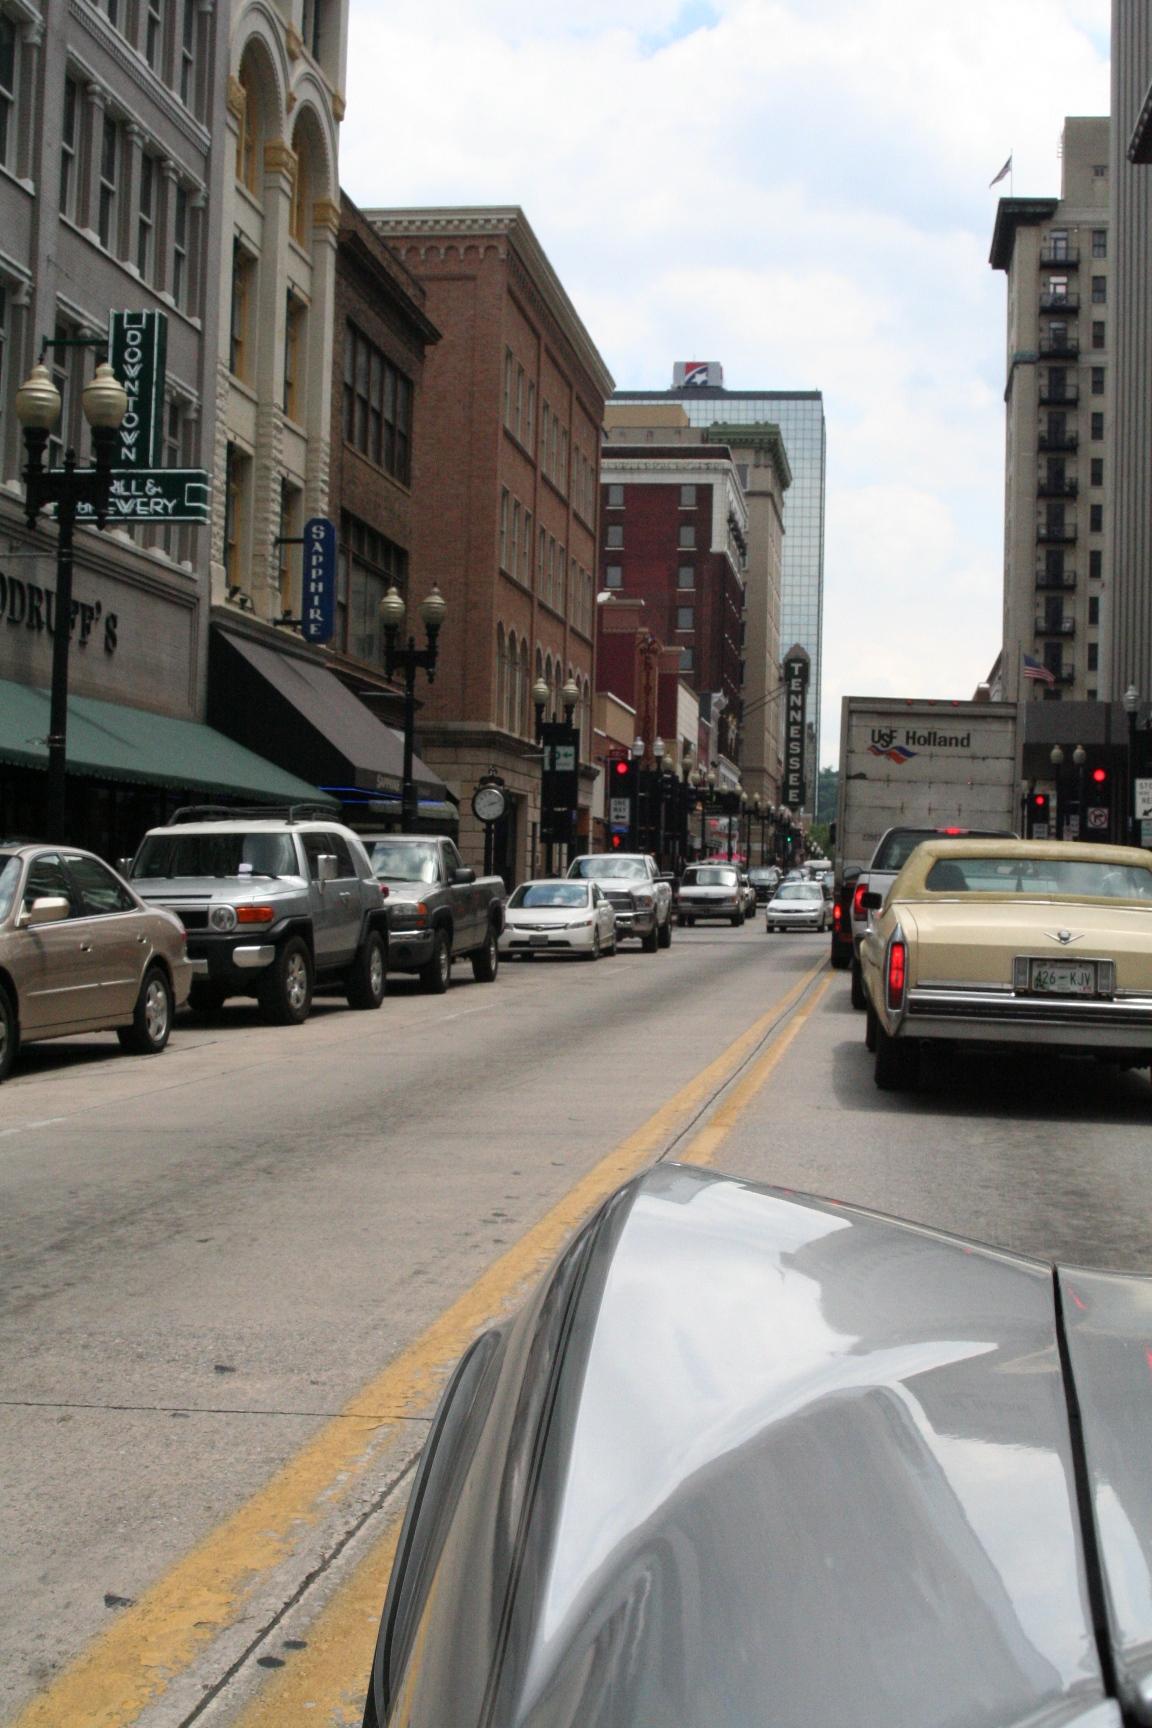 Downtown Knoxville, Tenn.